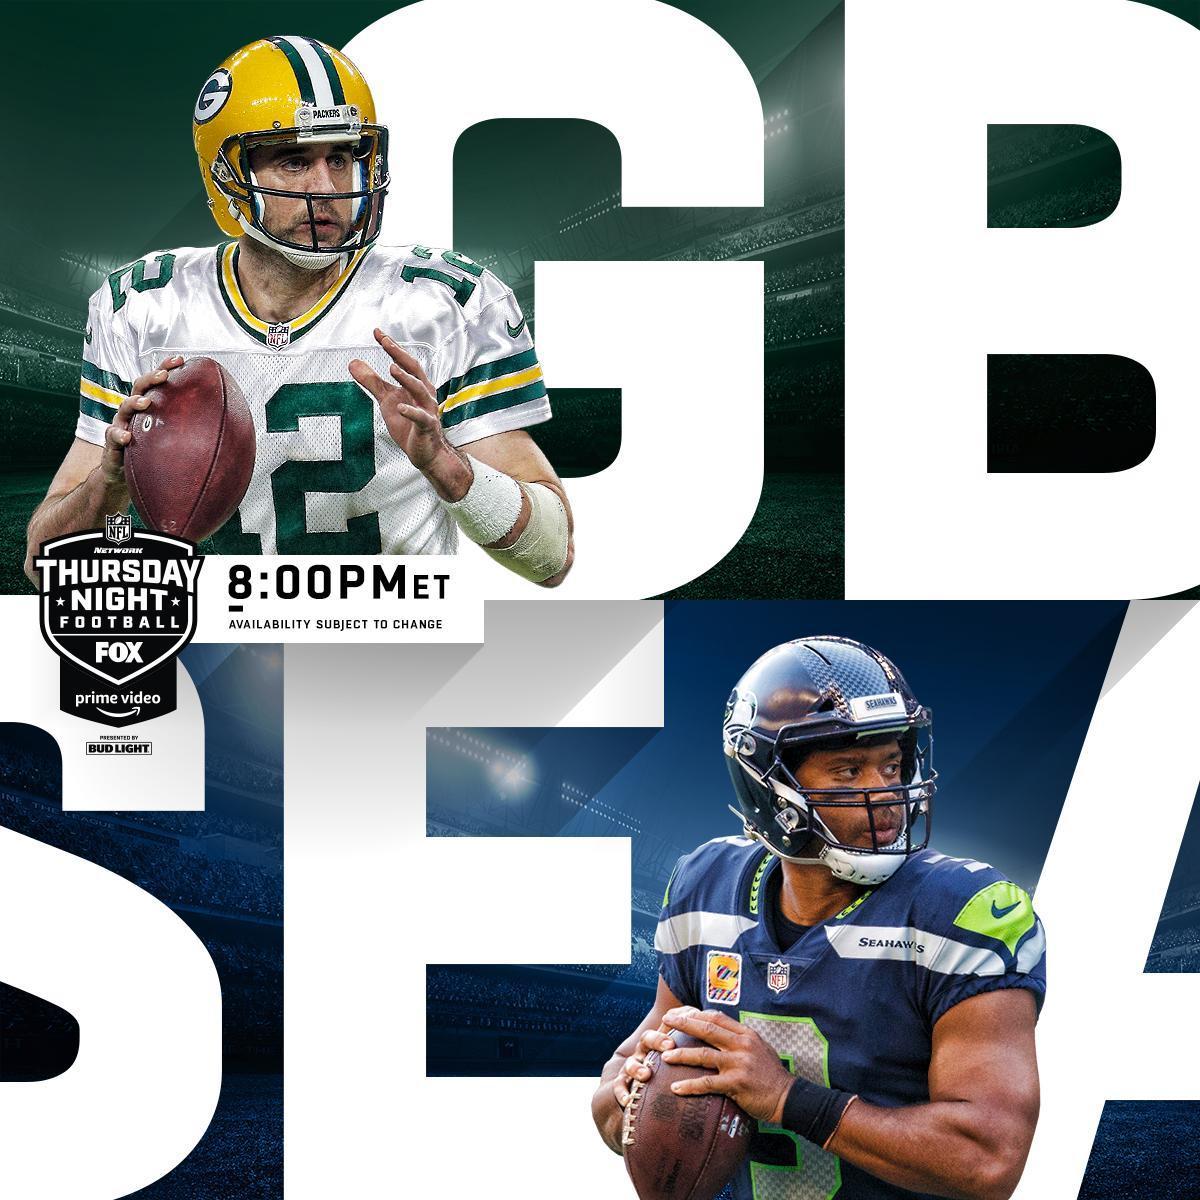 #GoPackGo #Seahawks Who ya got on #TNF?  #GBvsSEA: @nflnetwork | @NFLonFOX | @PrimeVideo